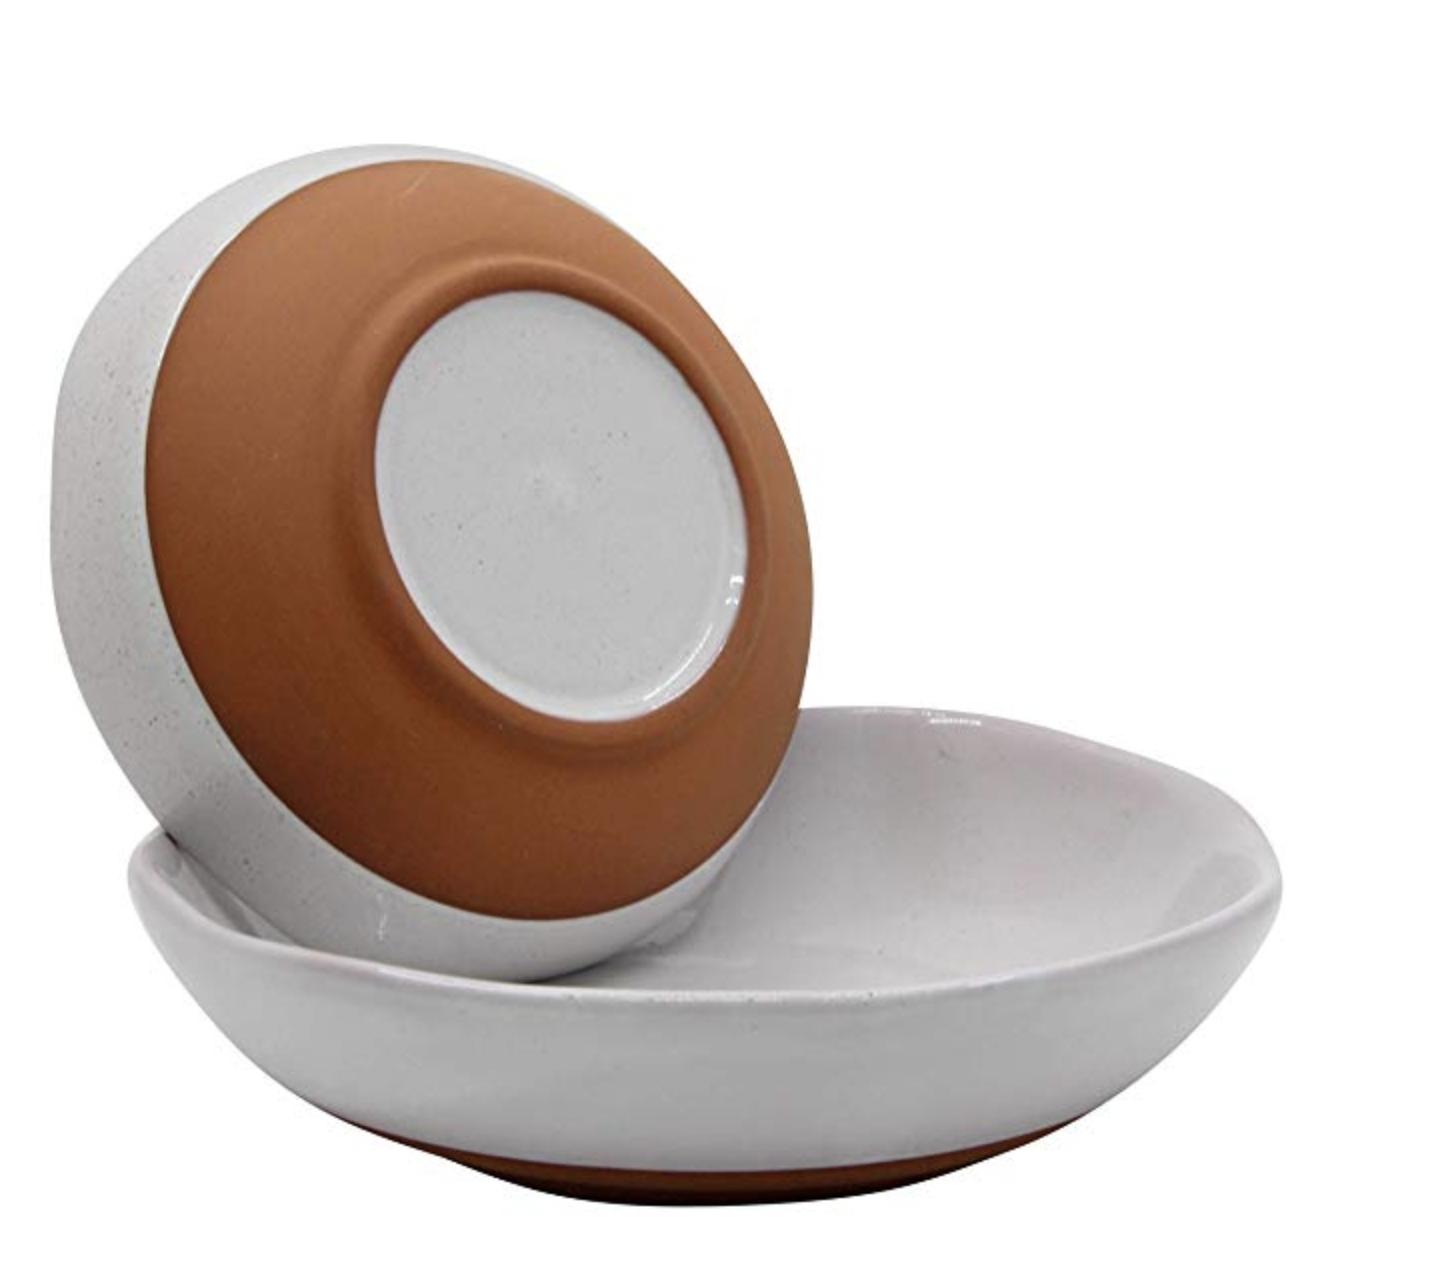 Ceramic Bowls - $17